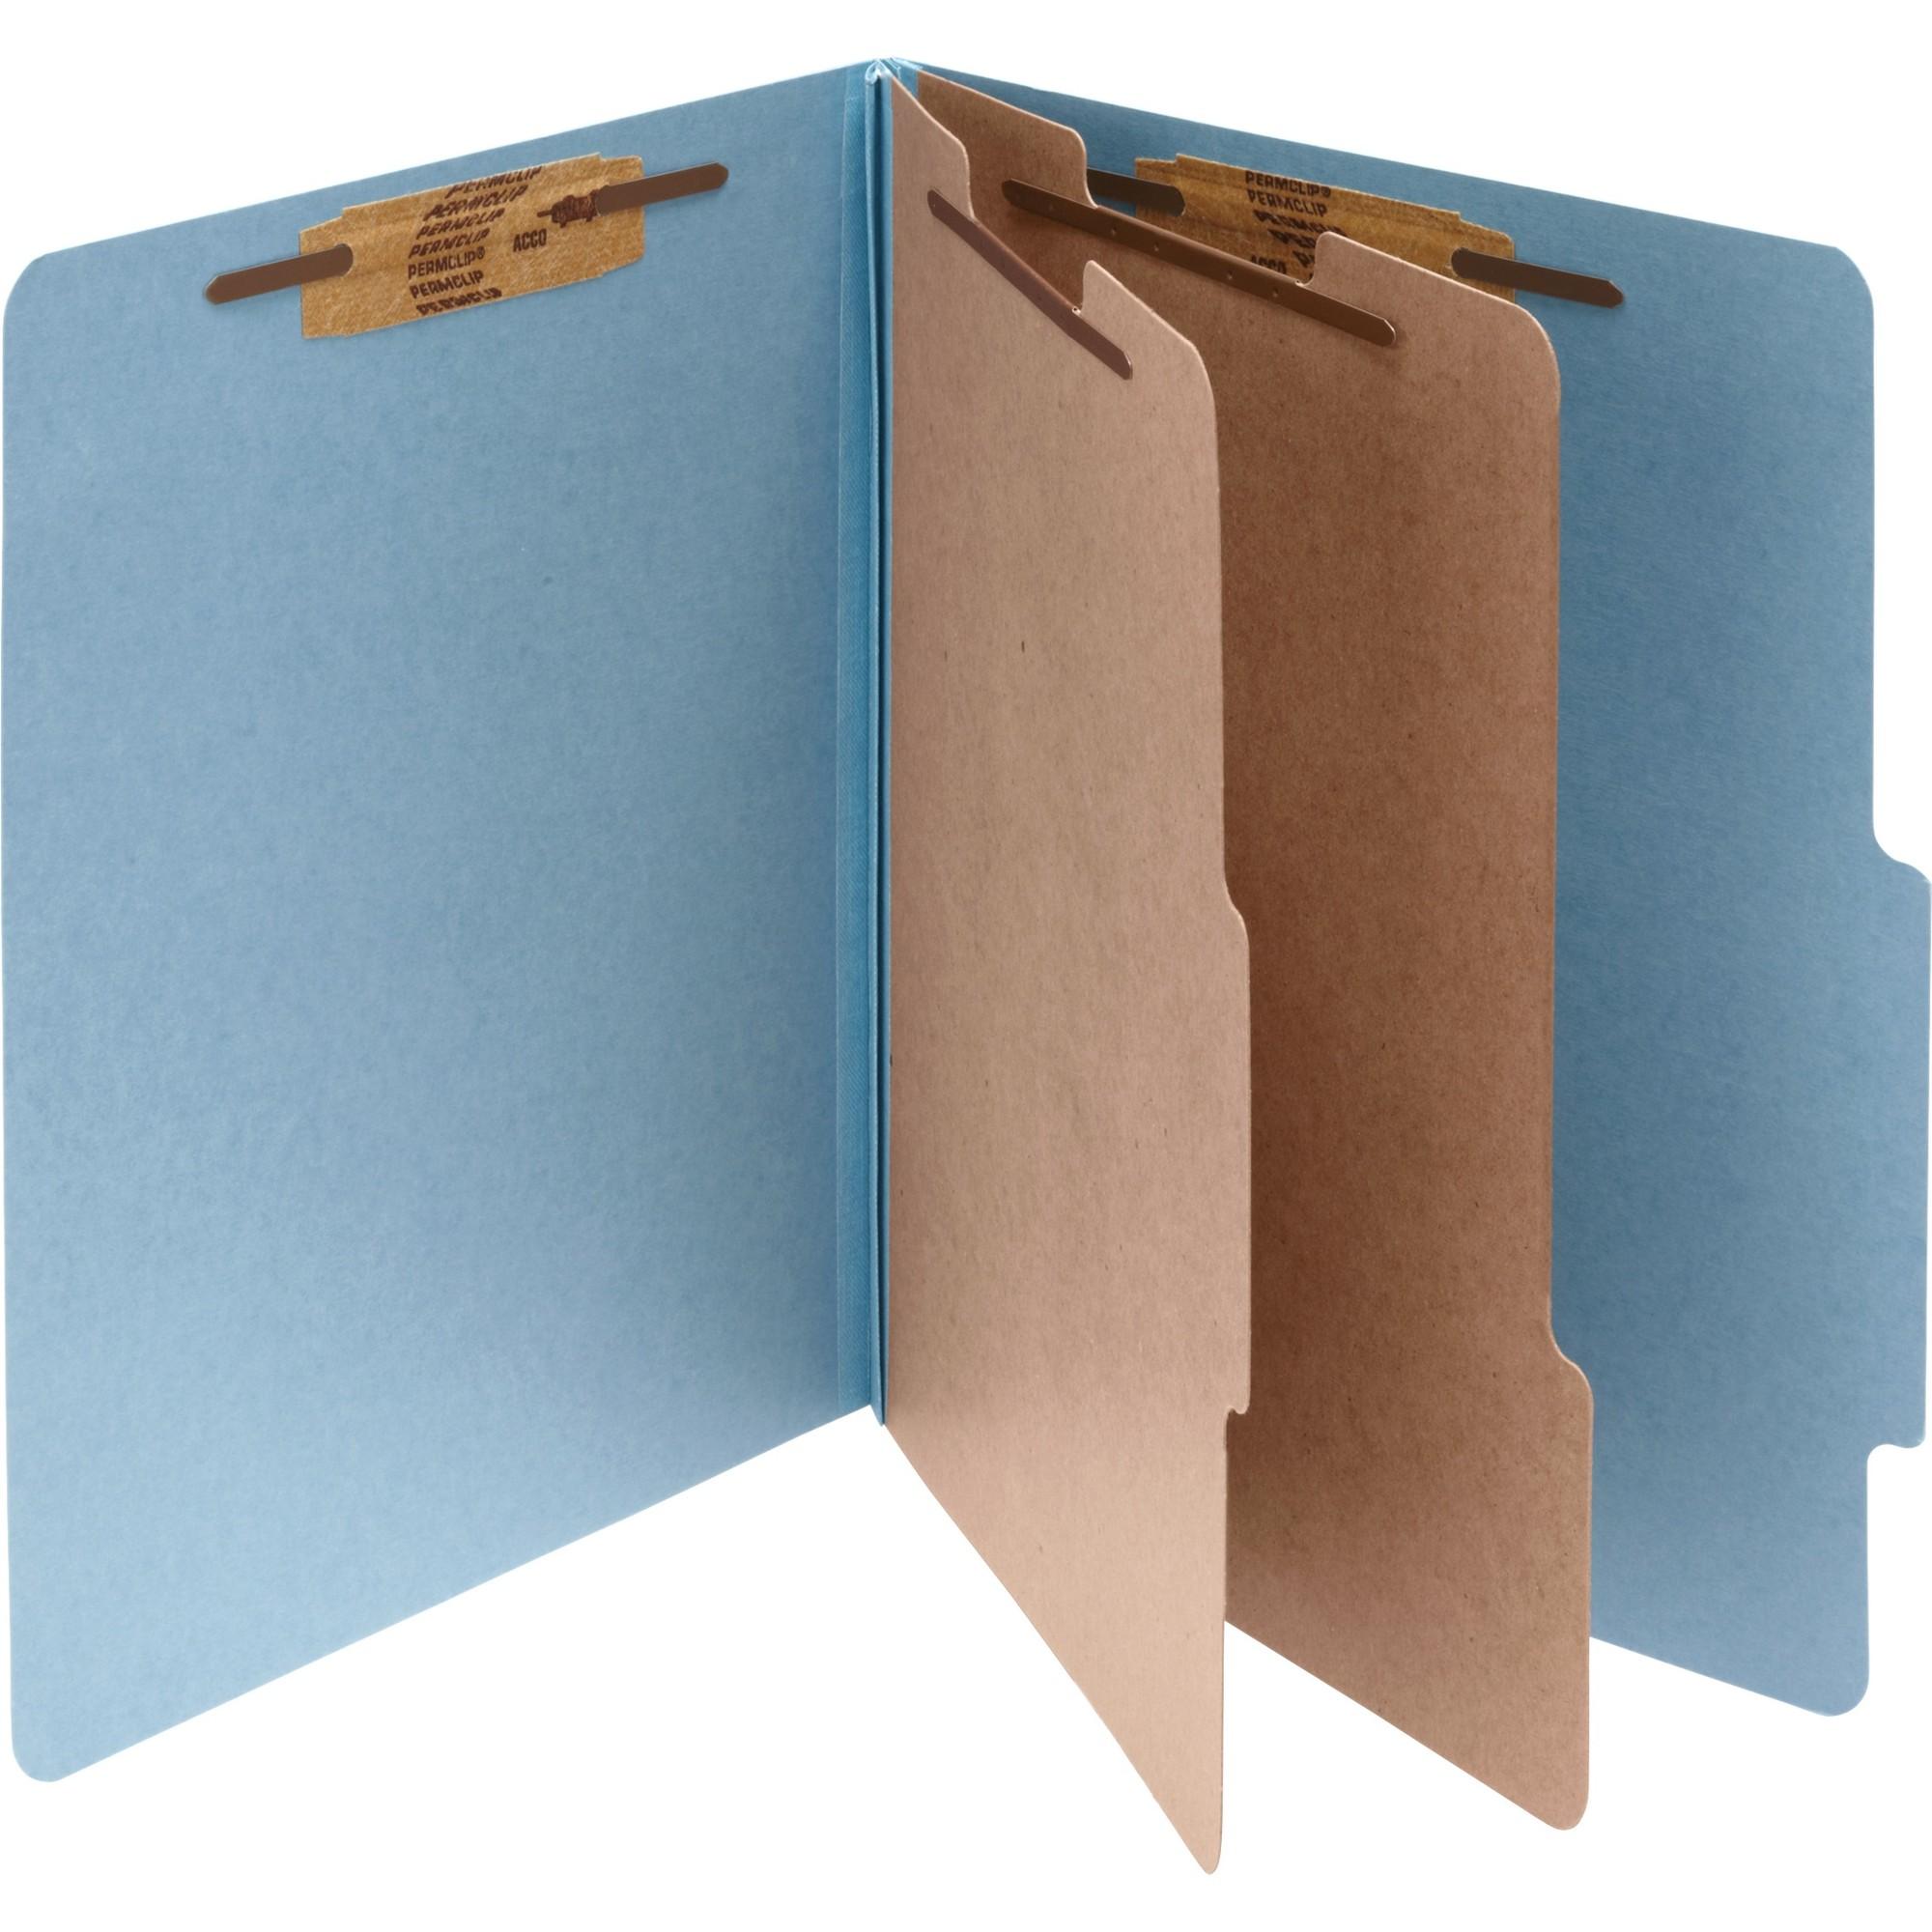 Pressboard 25-Pt Classification Folders, Legal, 6-Section, Sky Blue, 10/Box